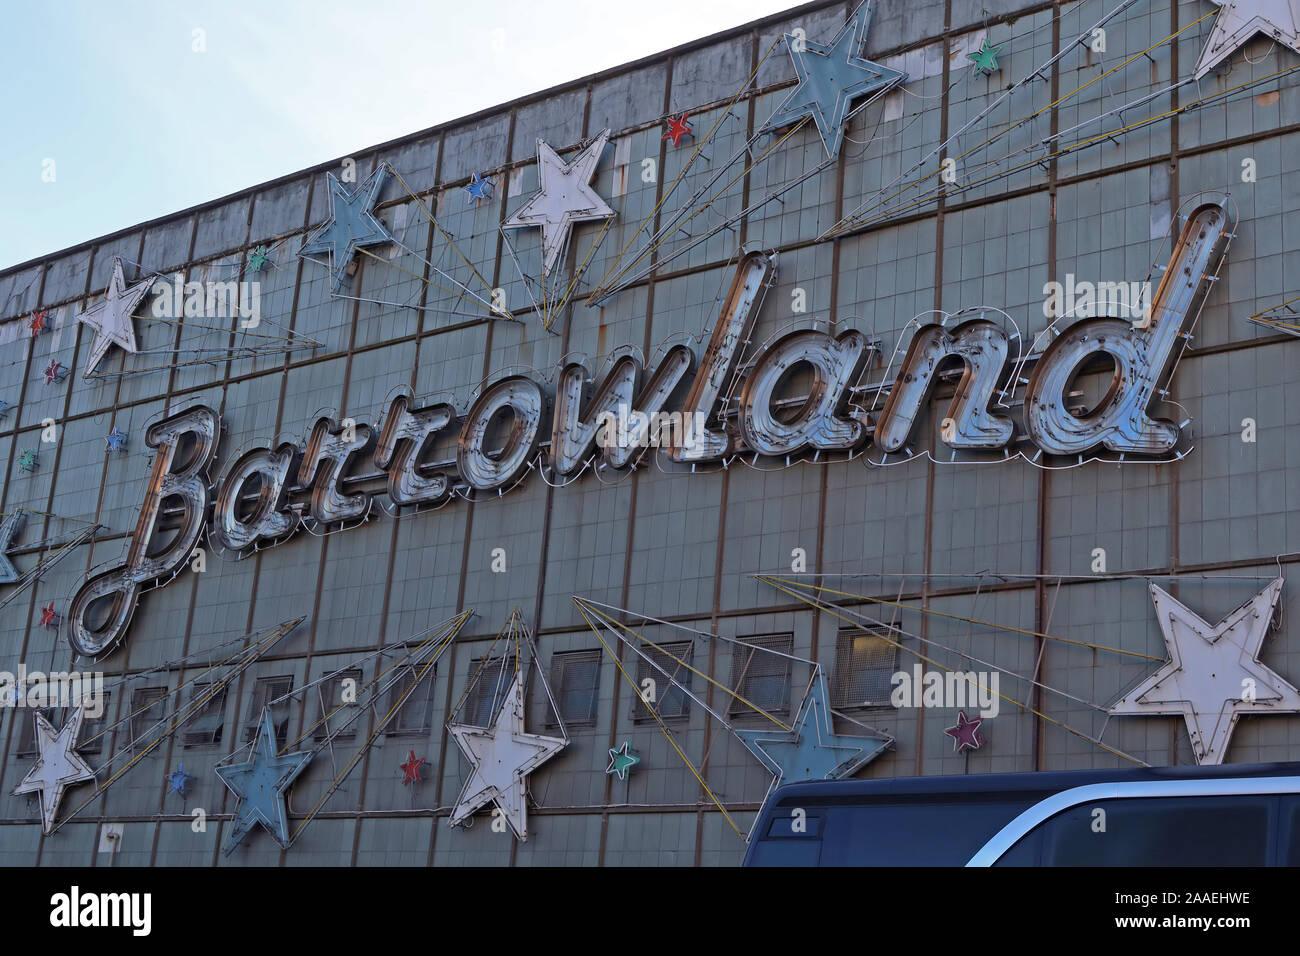 GotonySmith,UK,Scotland,Glasgow,city,HotpixUK,@HotpixUK,Glaswegian,notorious,seedy,signs,East End,G1 5DX,Calton,G1,The Barras,Margaret Maggie McIver,Glasgow Barrowland market,Barrowland building,neon sign,stars,Bible John Murders